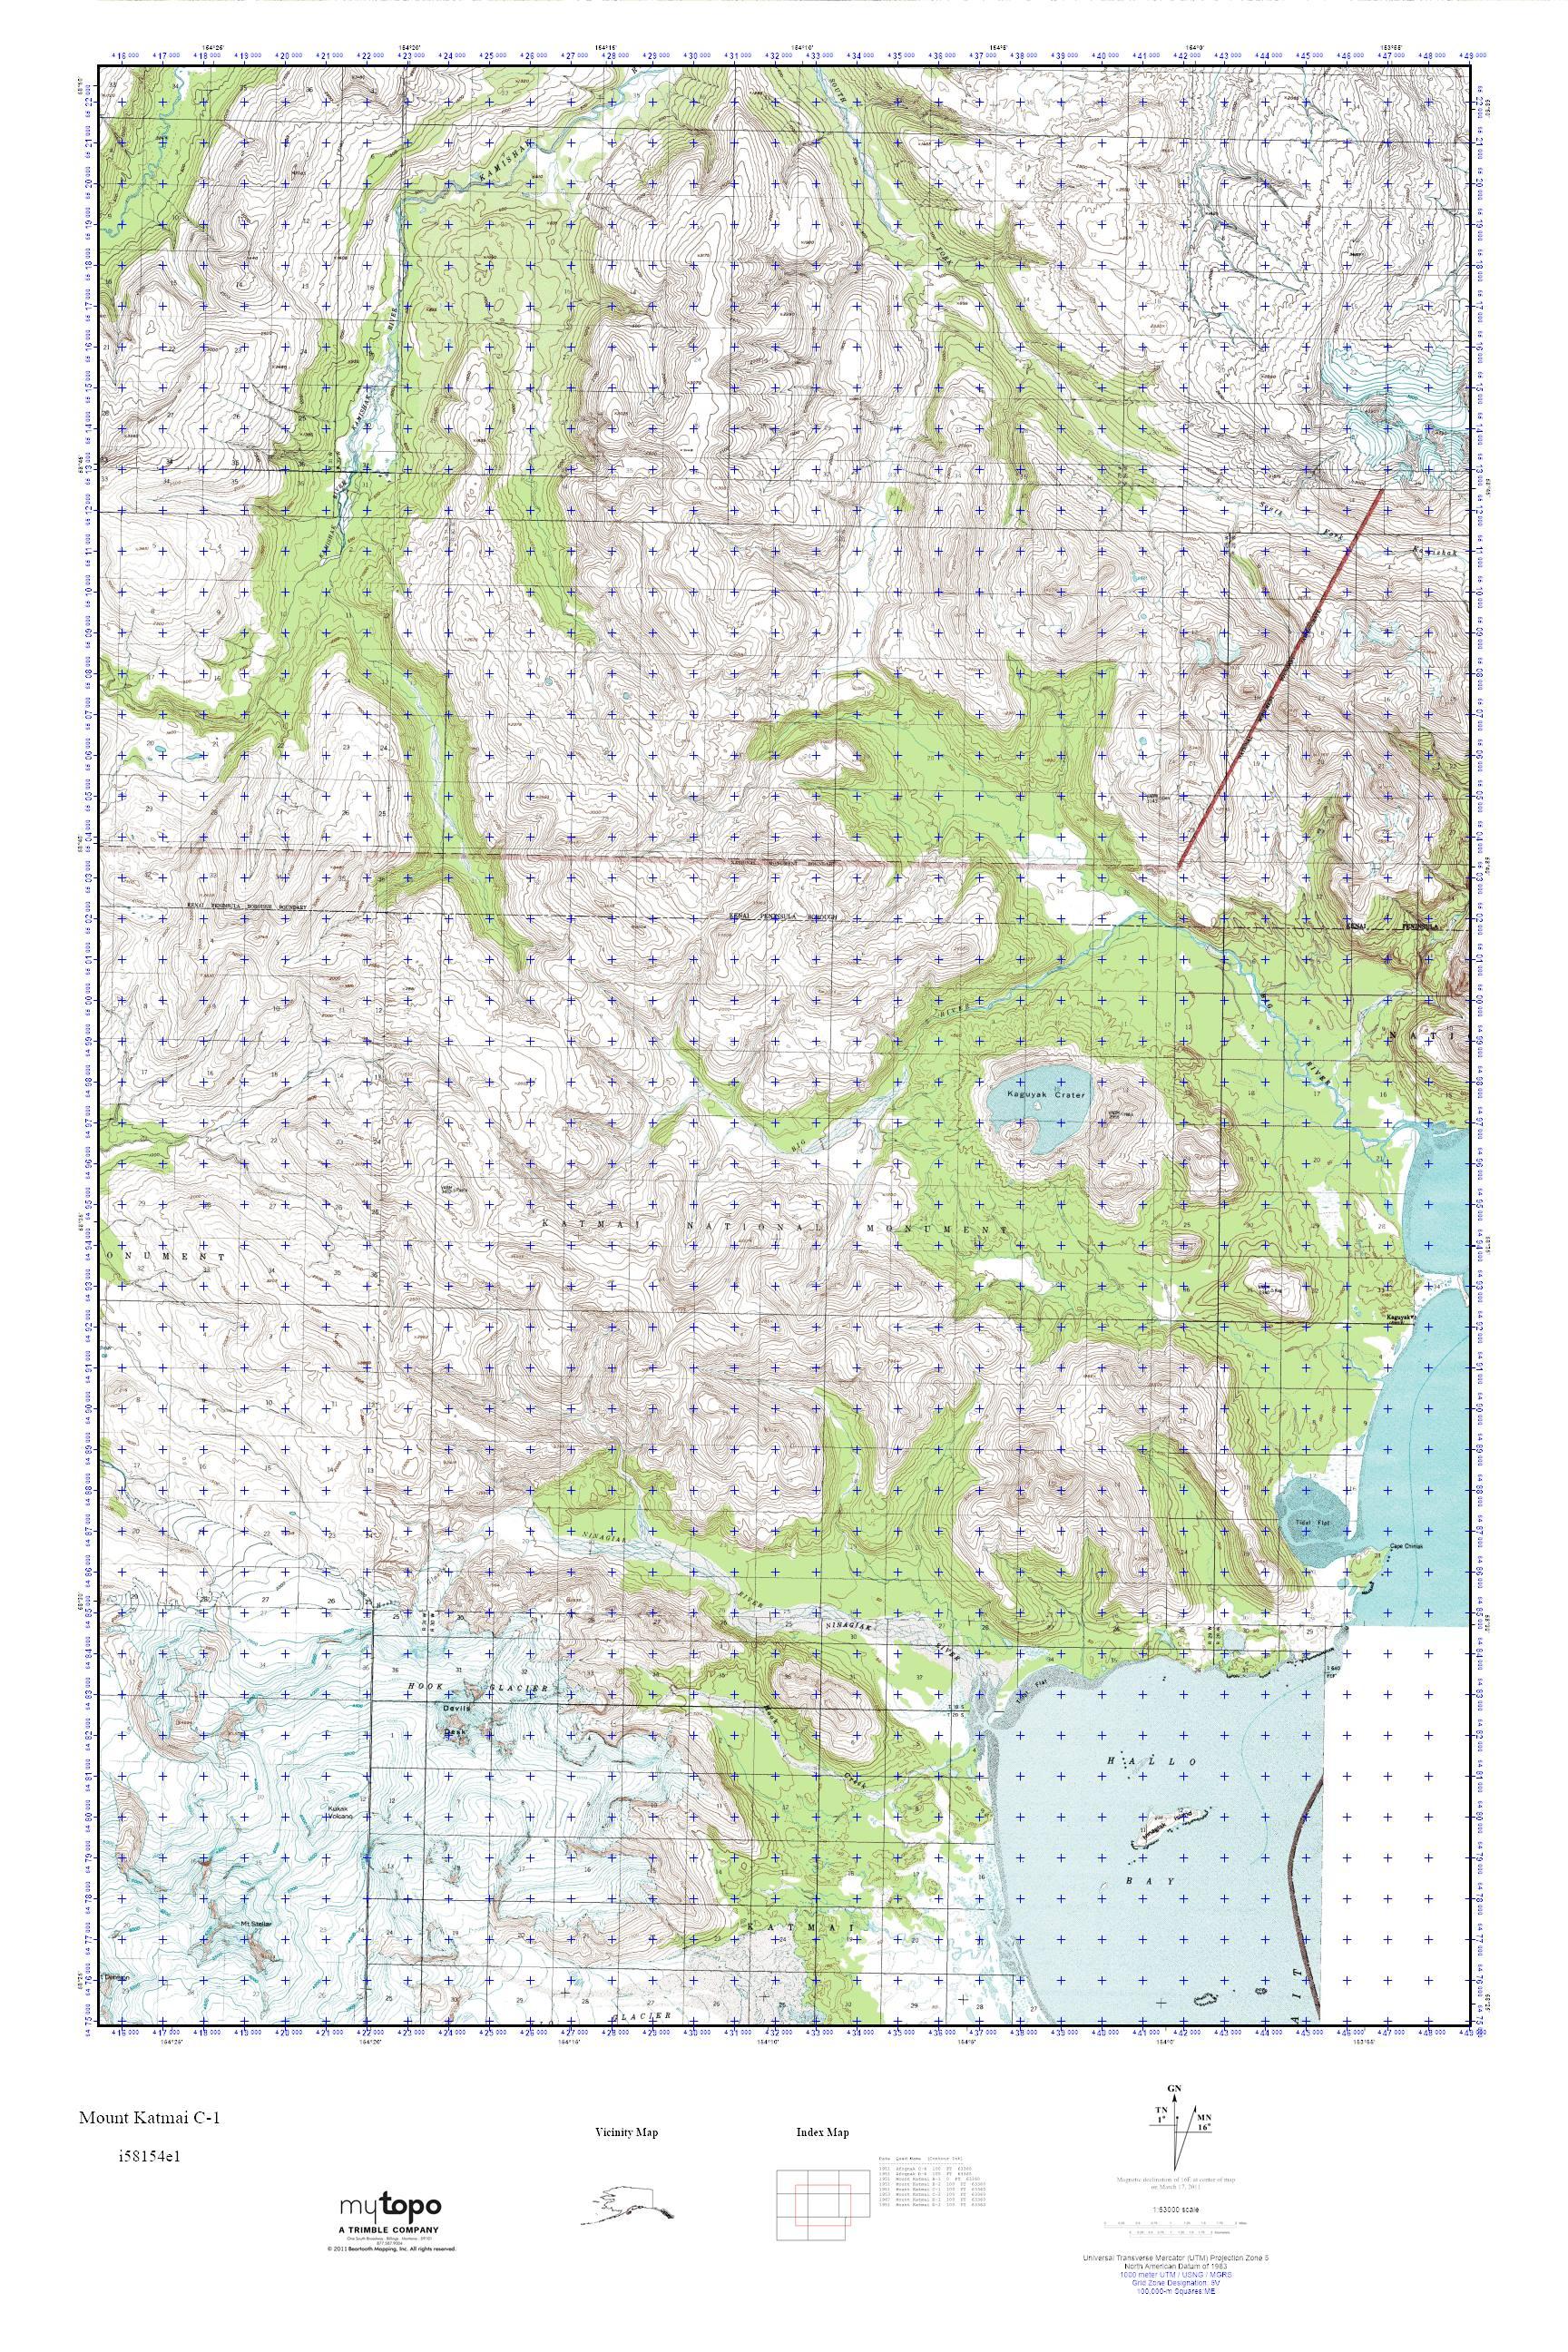 MyTopo Mount Katmai C-1, Alaska USGS Quad Topo Map